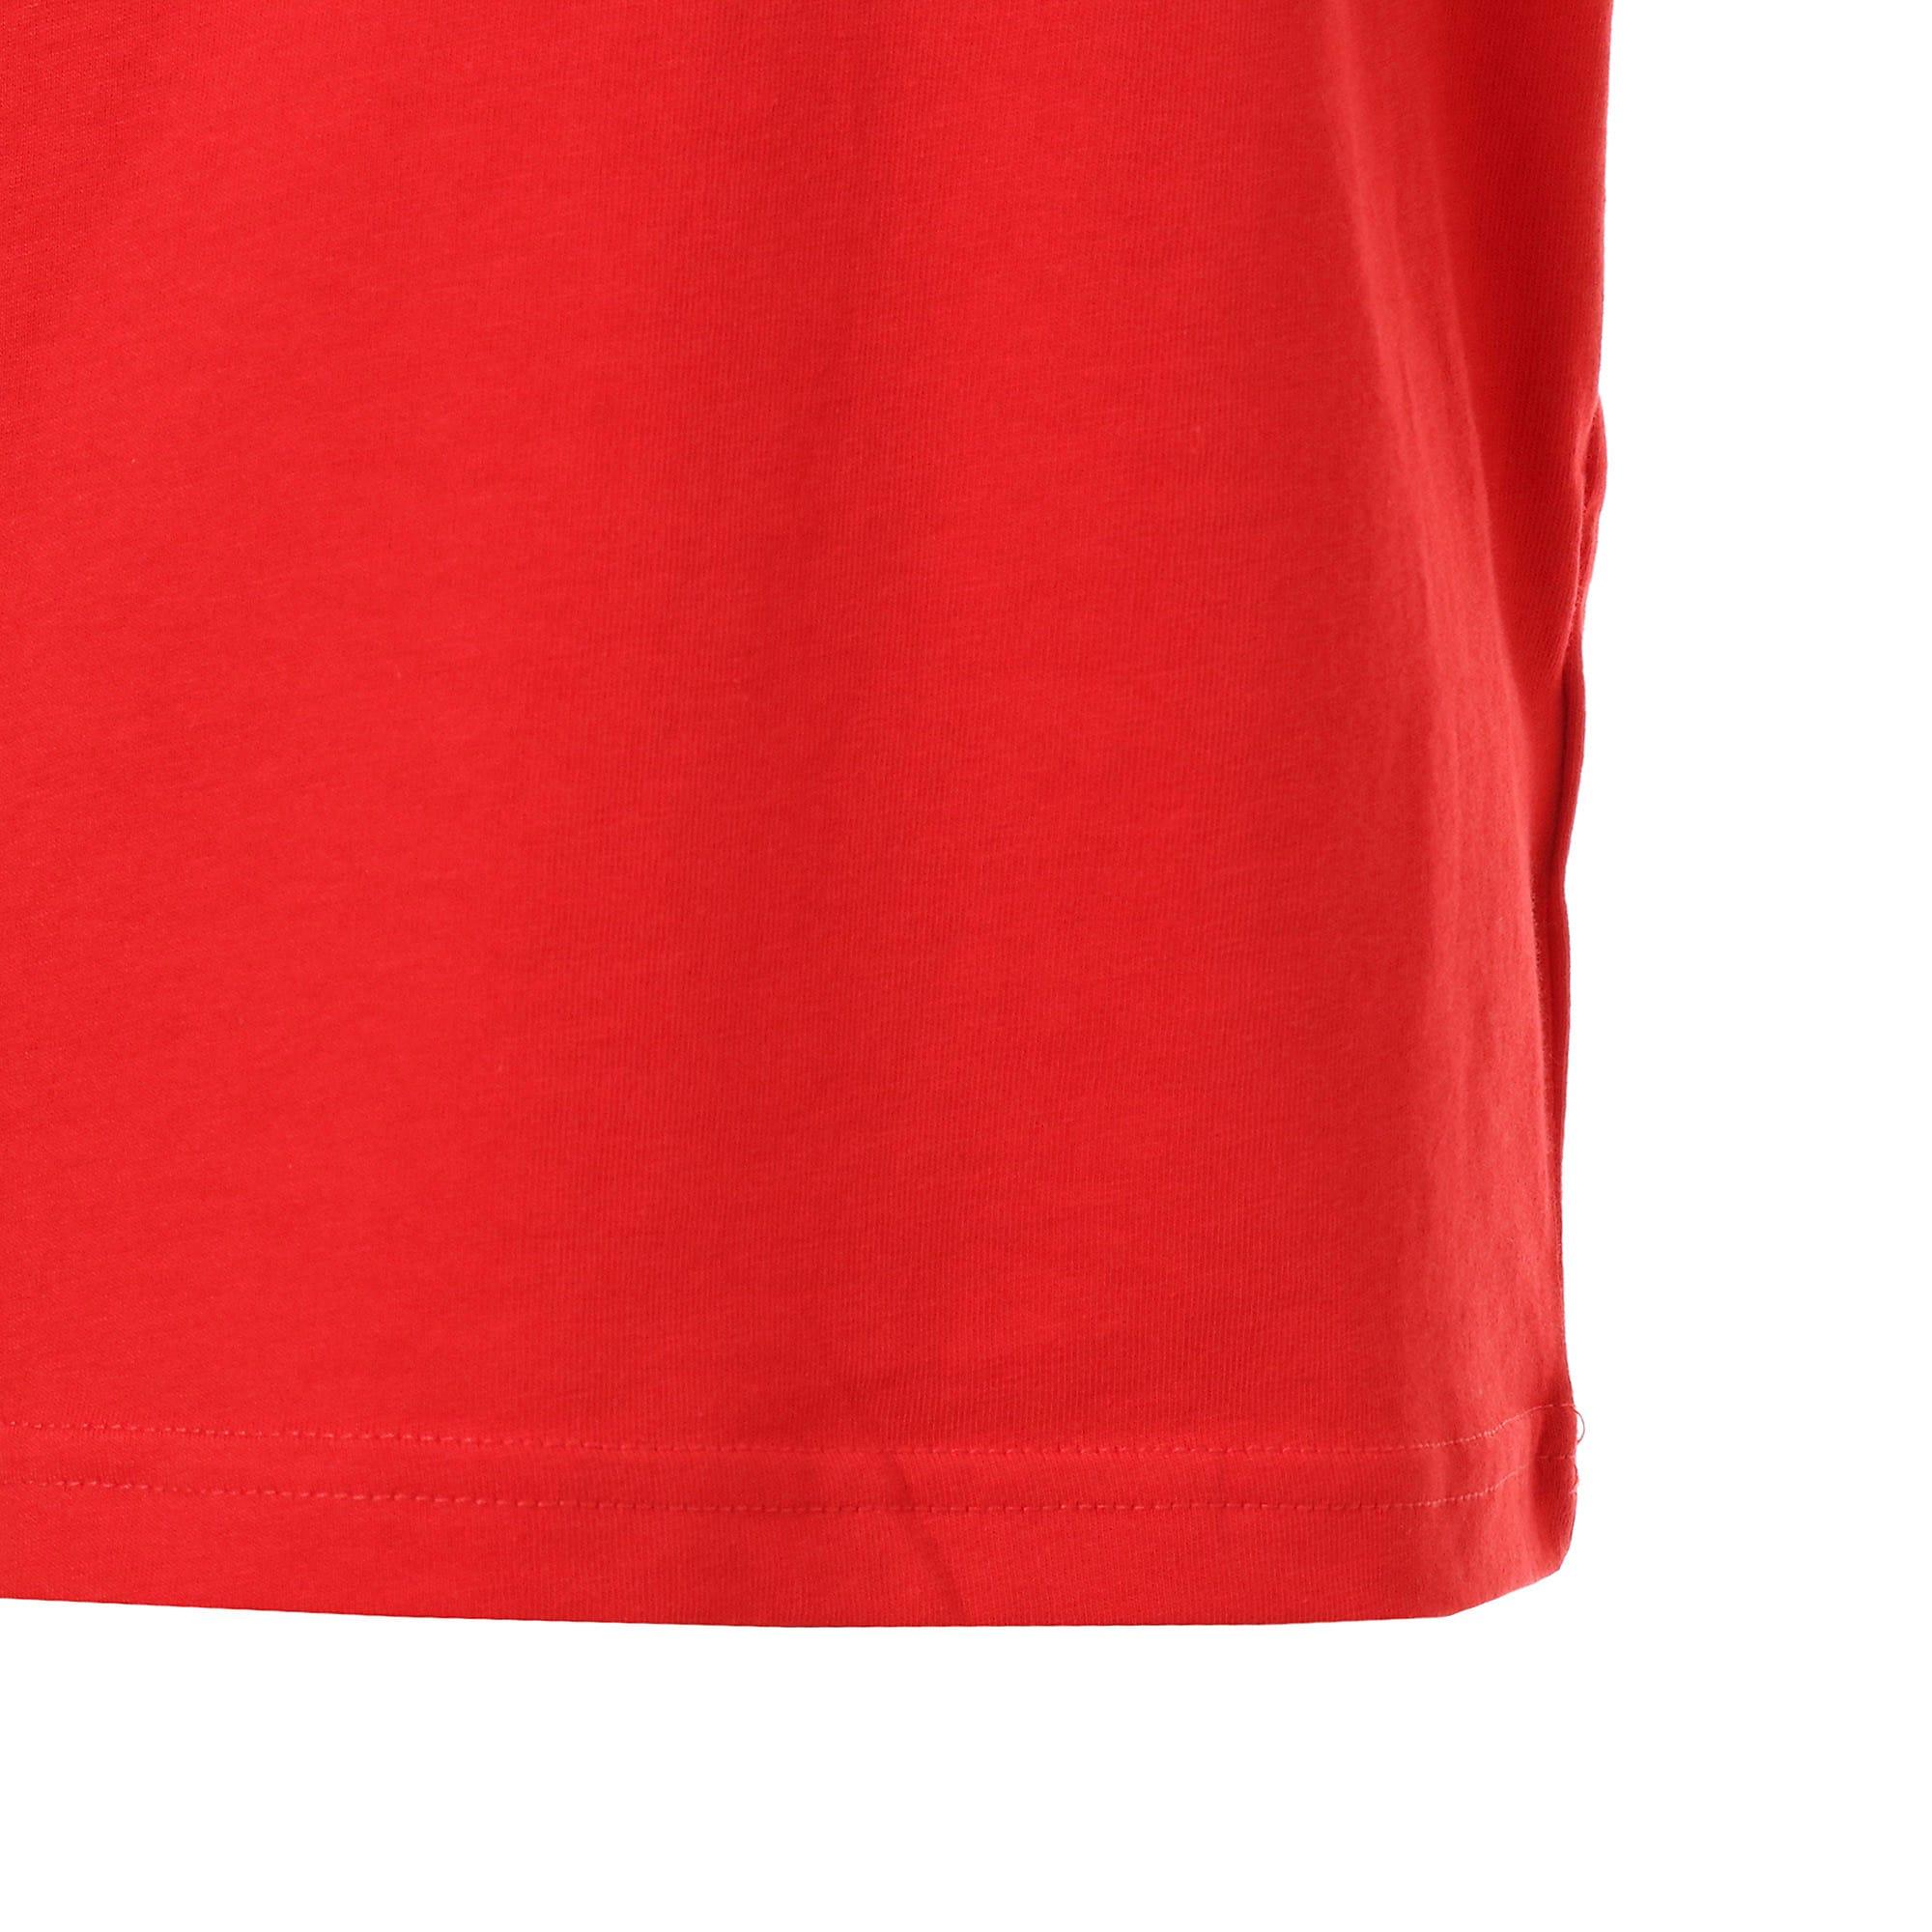 Thumbnail 6 of キッズ ALPHA SS トレンド Tシャツ 半袖, High Risk Red, medium-JPN